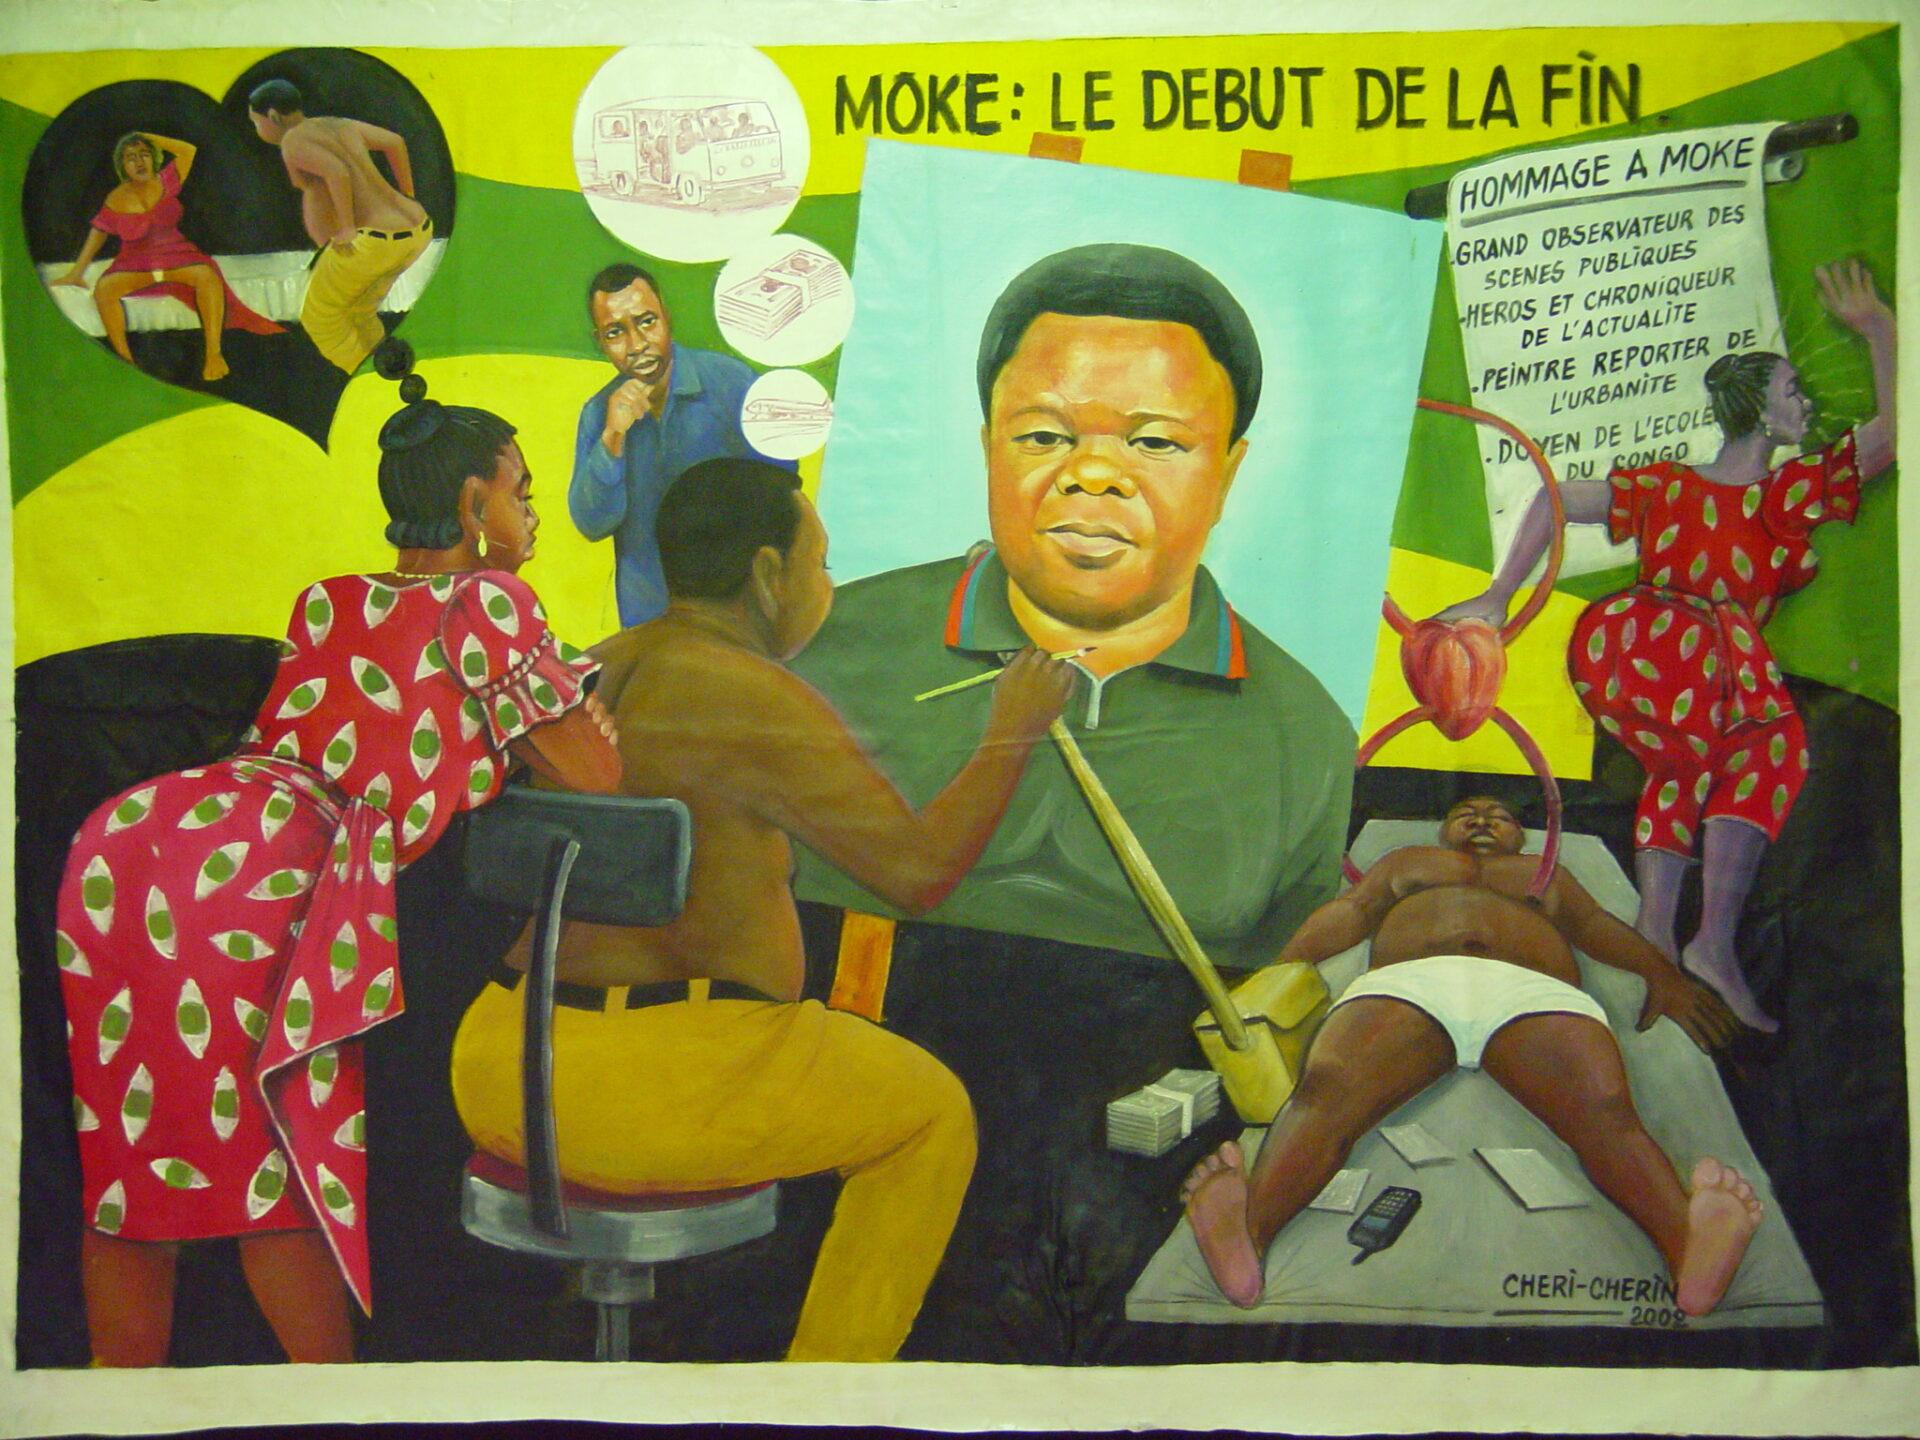 Chéri Cherin, Kinshasa, 2002, Moke : poczatek konca, Collection MRAC Tervuren, Fonds B. Jewsiewicki